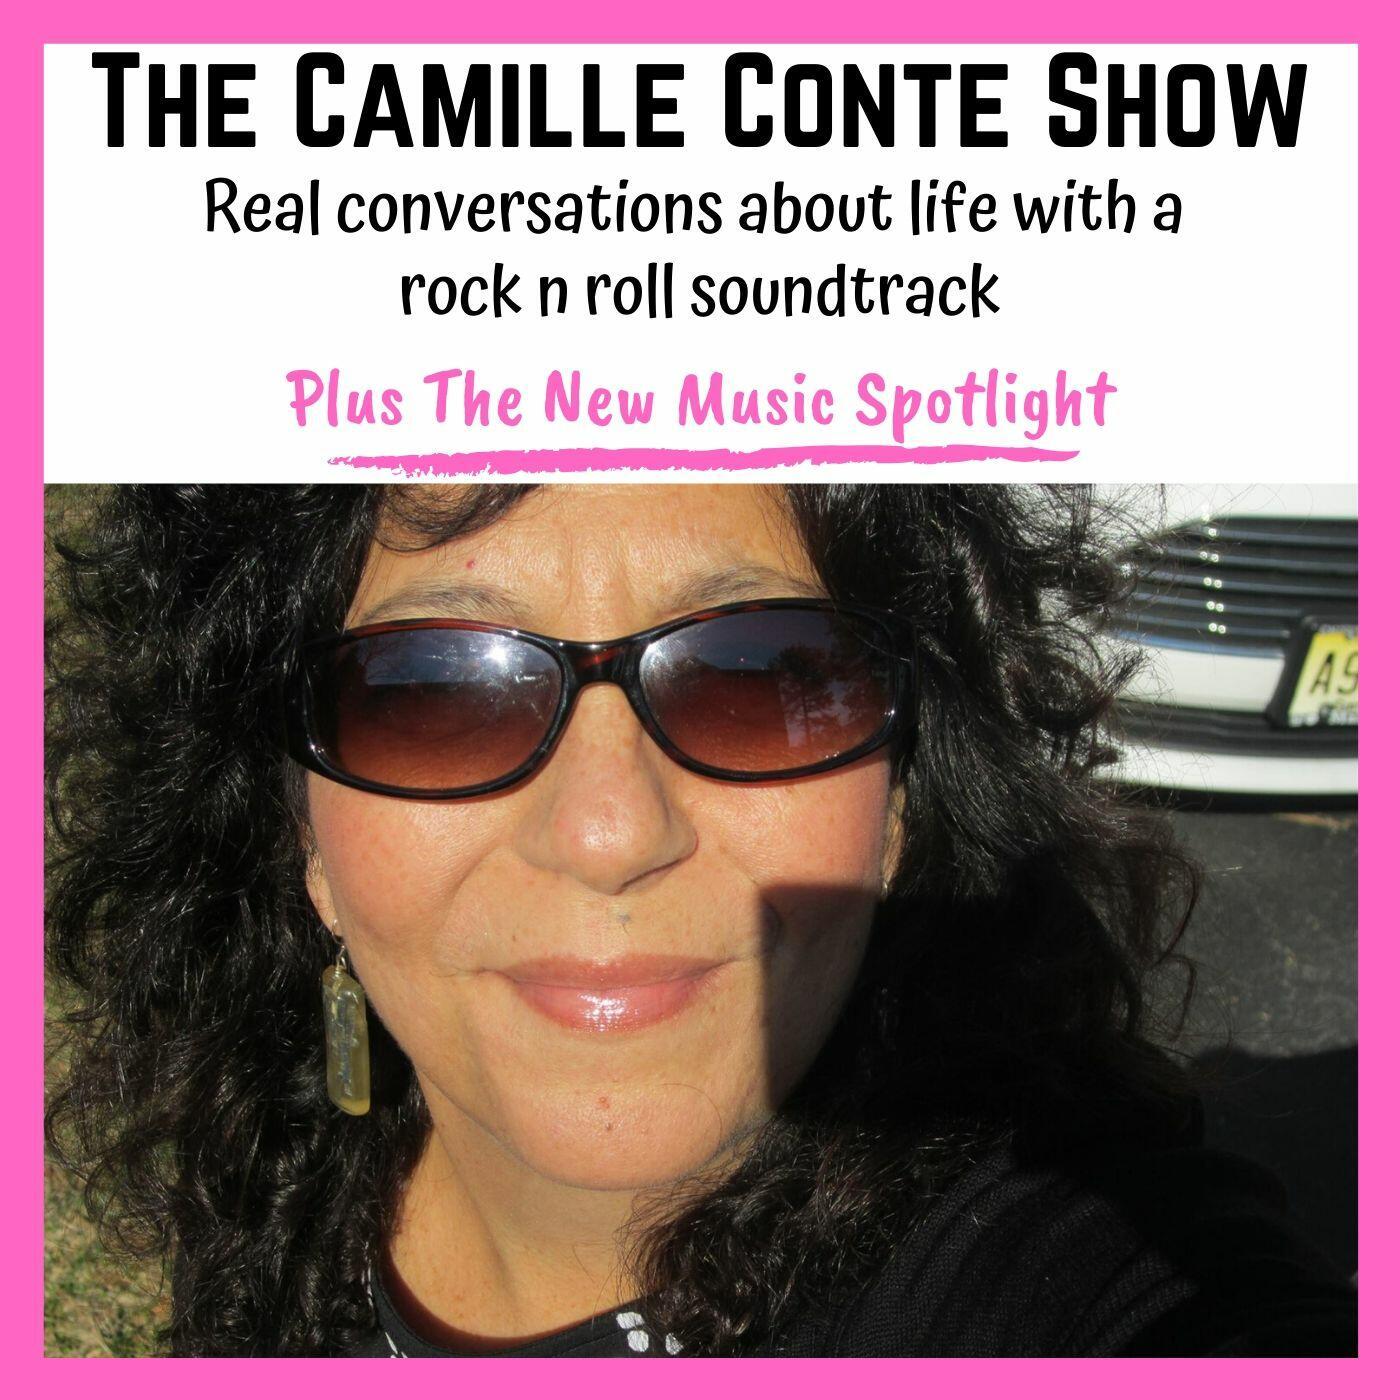 The Camille Conte Show